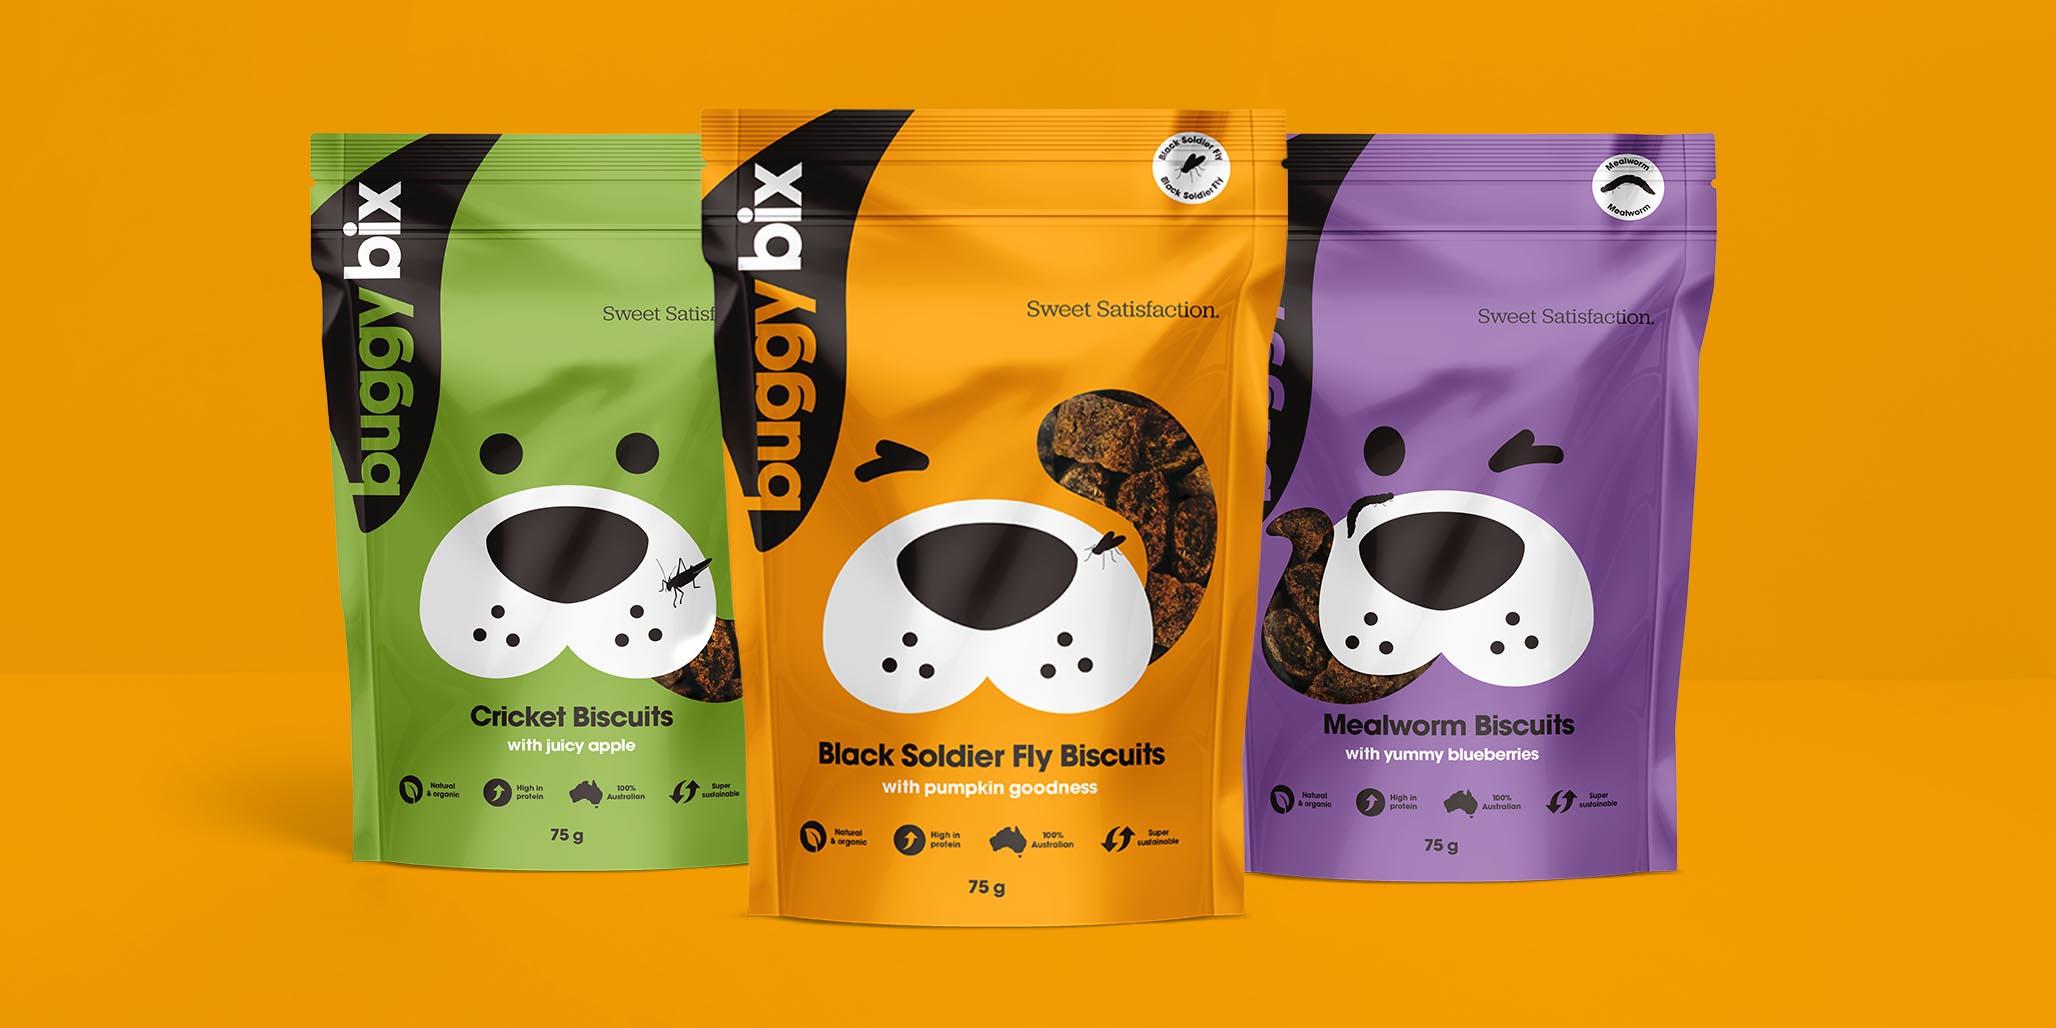 Website Design project image for pet food website design by Percept creative agencies Sydney, case study image G